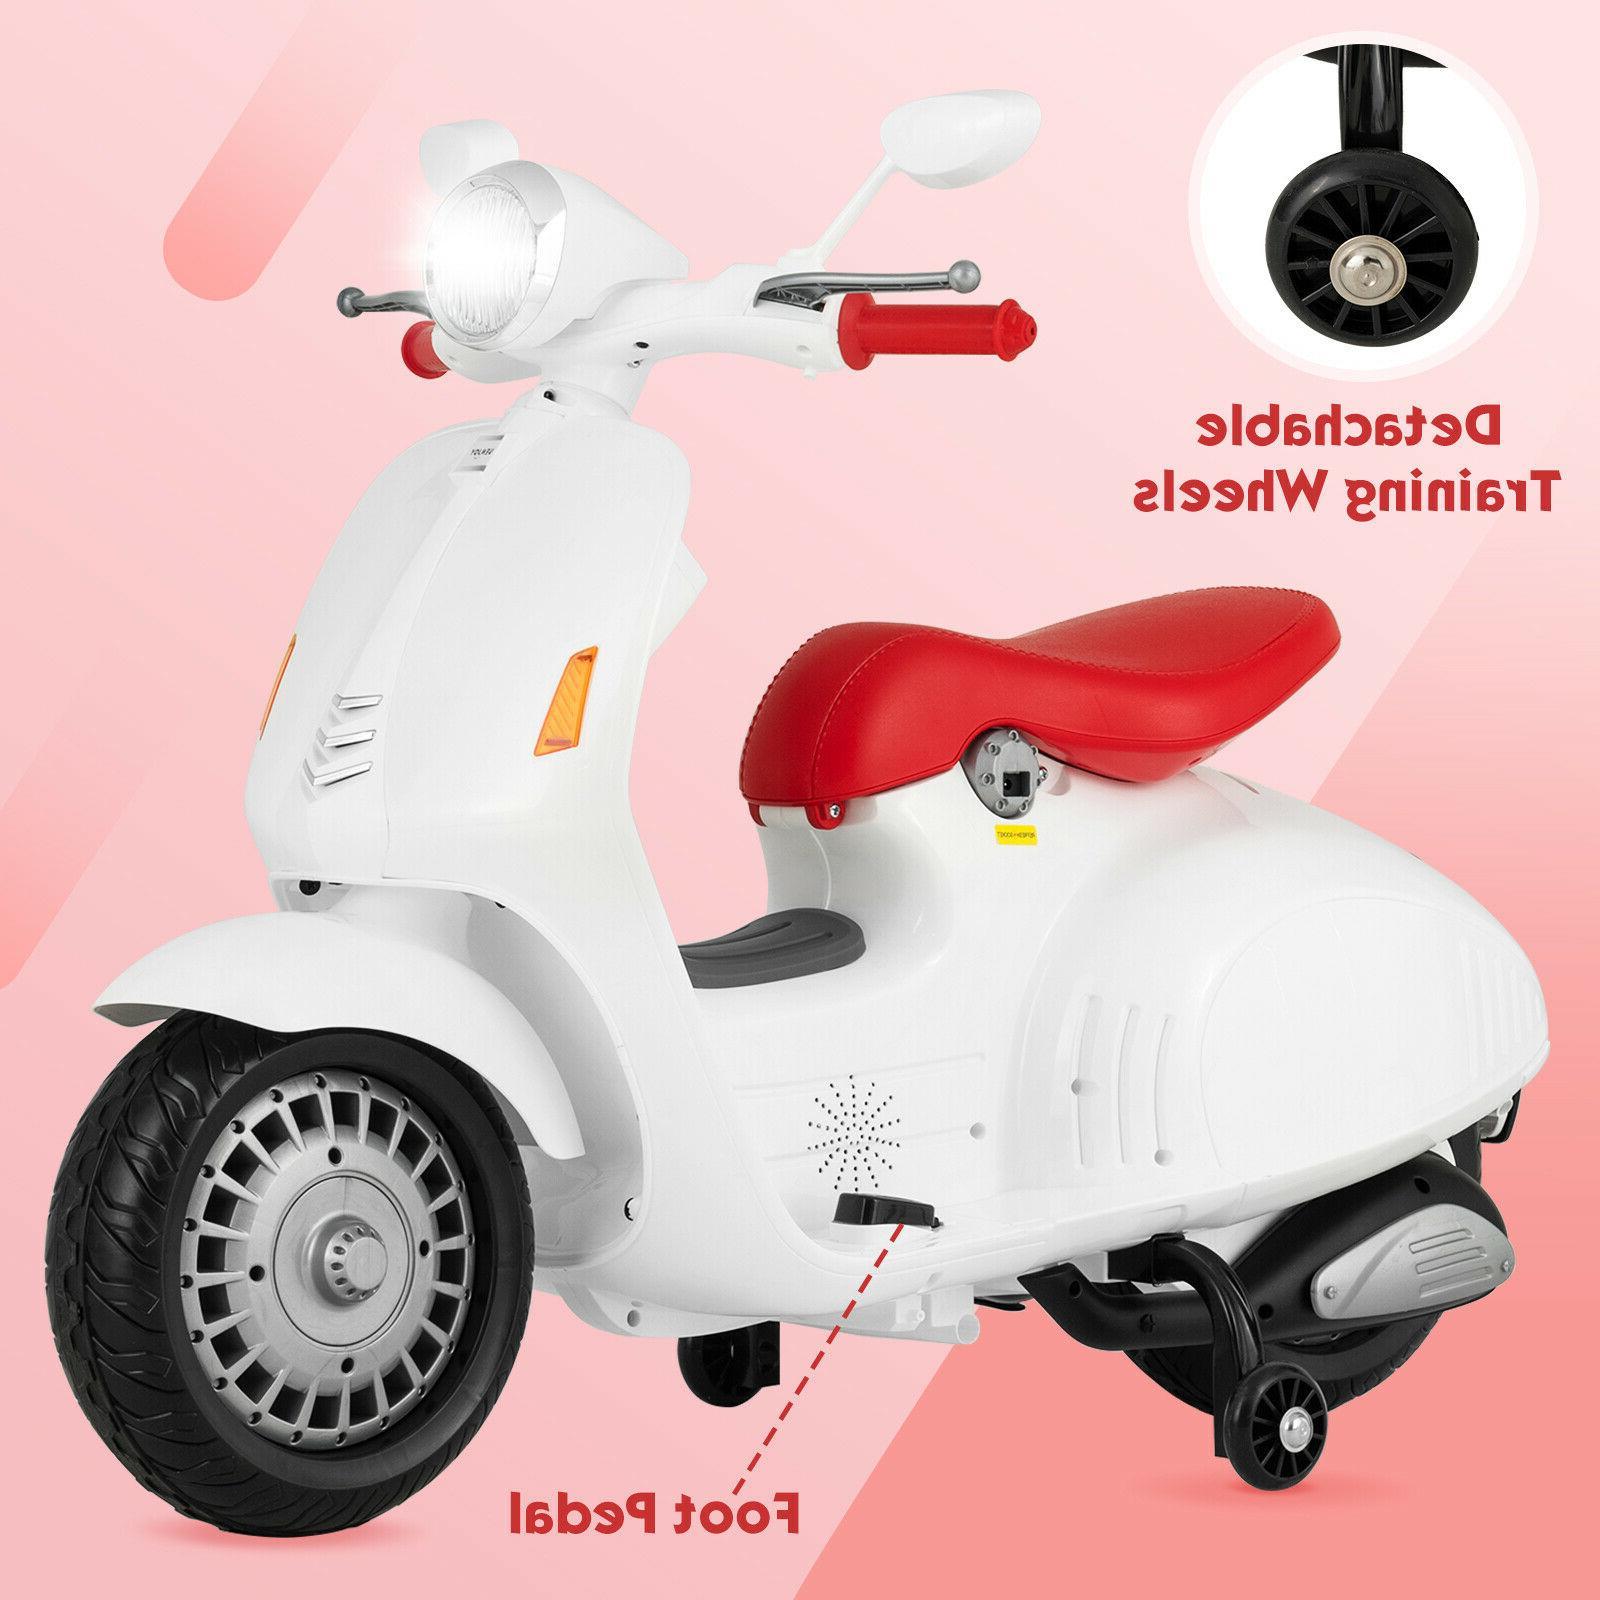 12V Children Electric Motorcycle Wheels